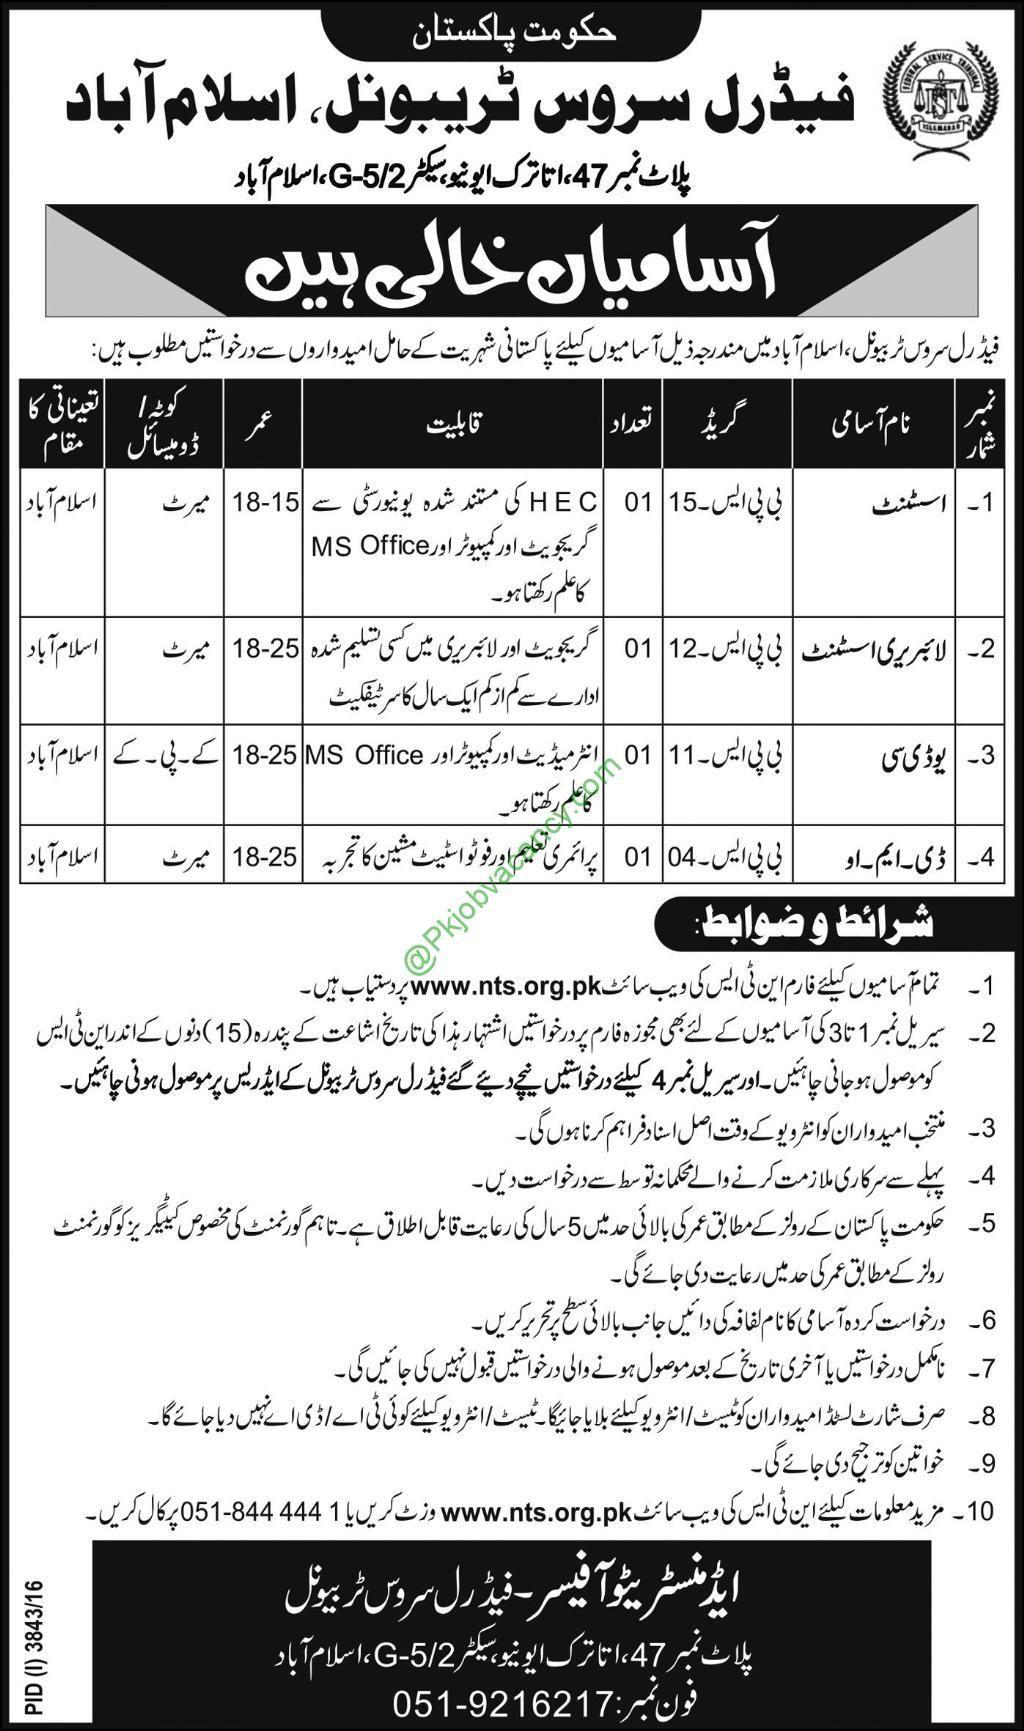 Federal services tribunal islamabad nts jobs application form federal services tribunal islamabad nts jobs application form download 2017 falaconquin